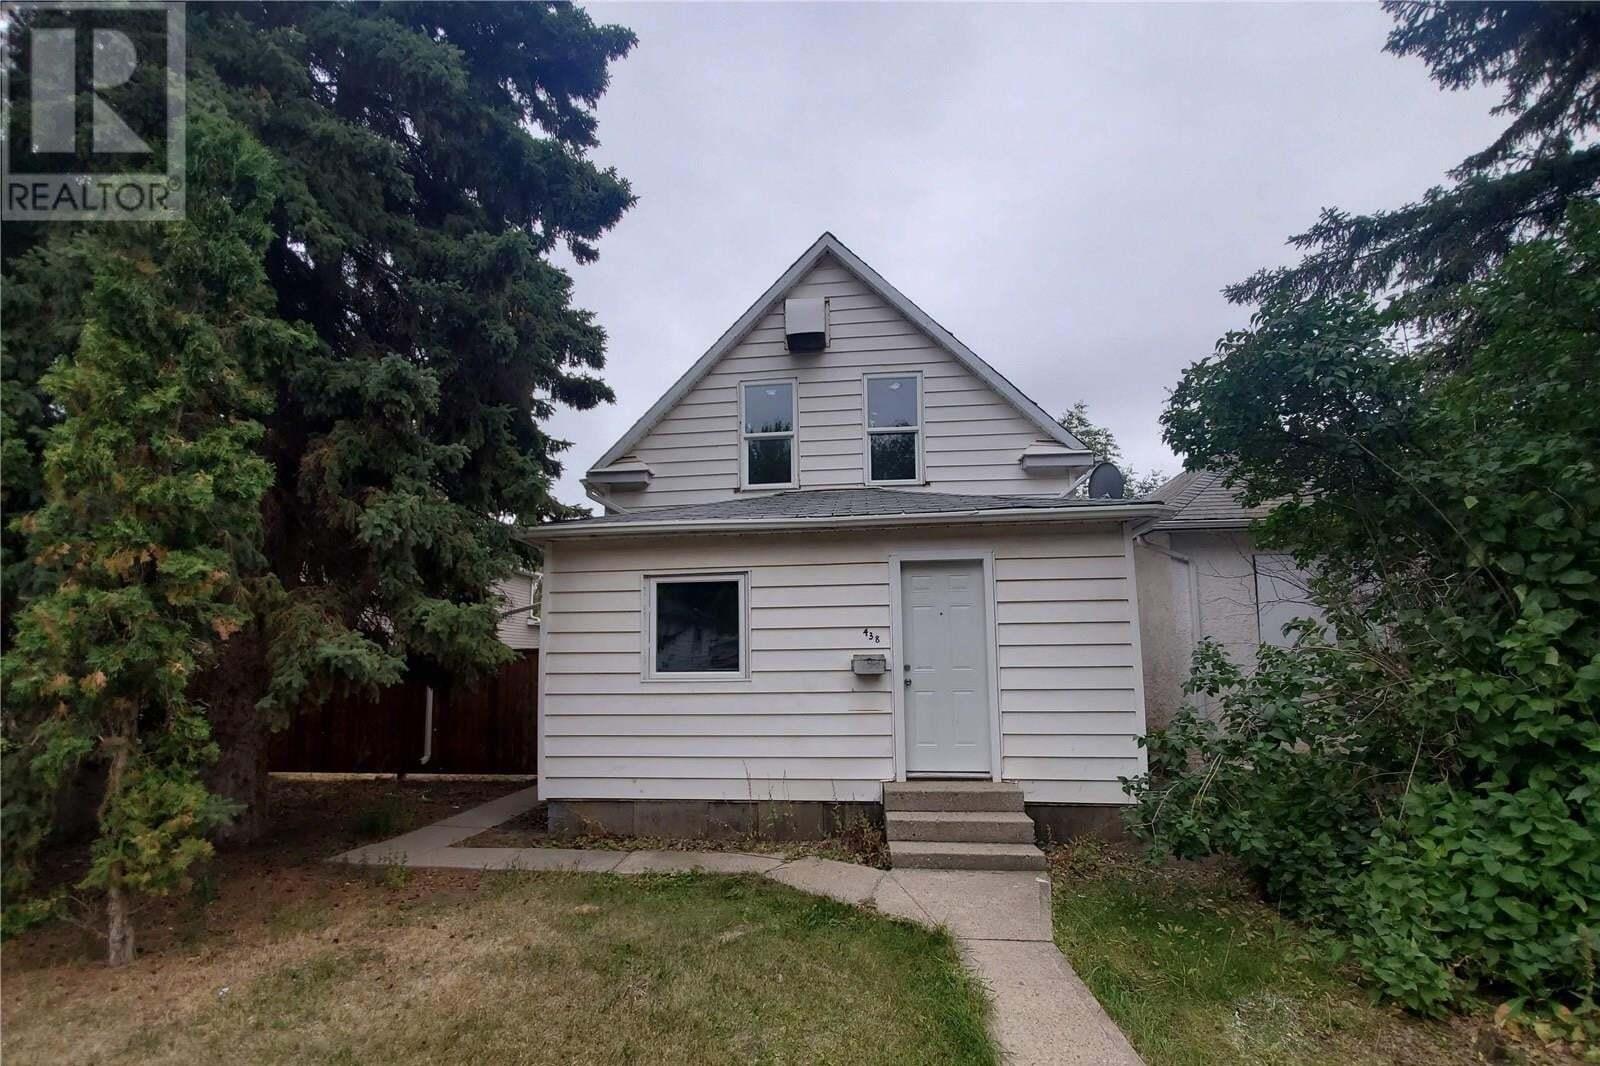 House for sale at 438 S Ave S Saskatoon Saskatchewan - MLS: SK826926